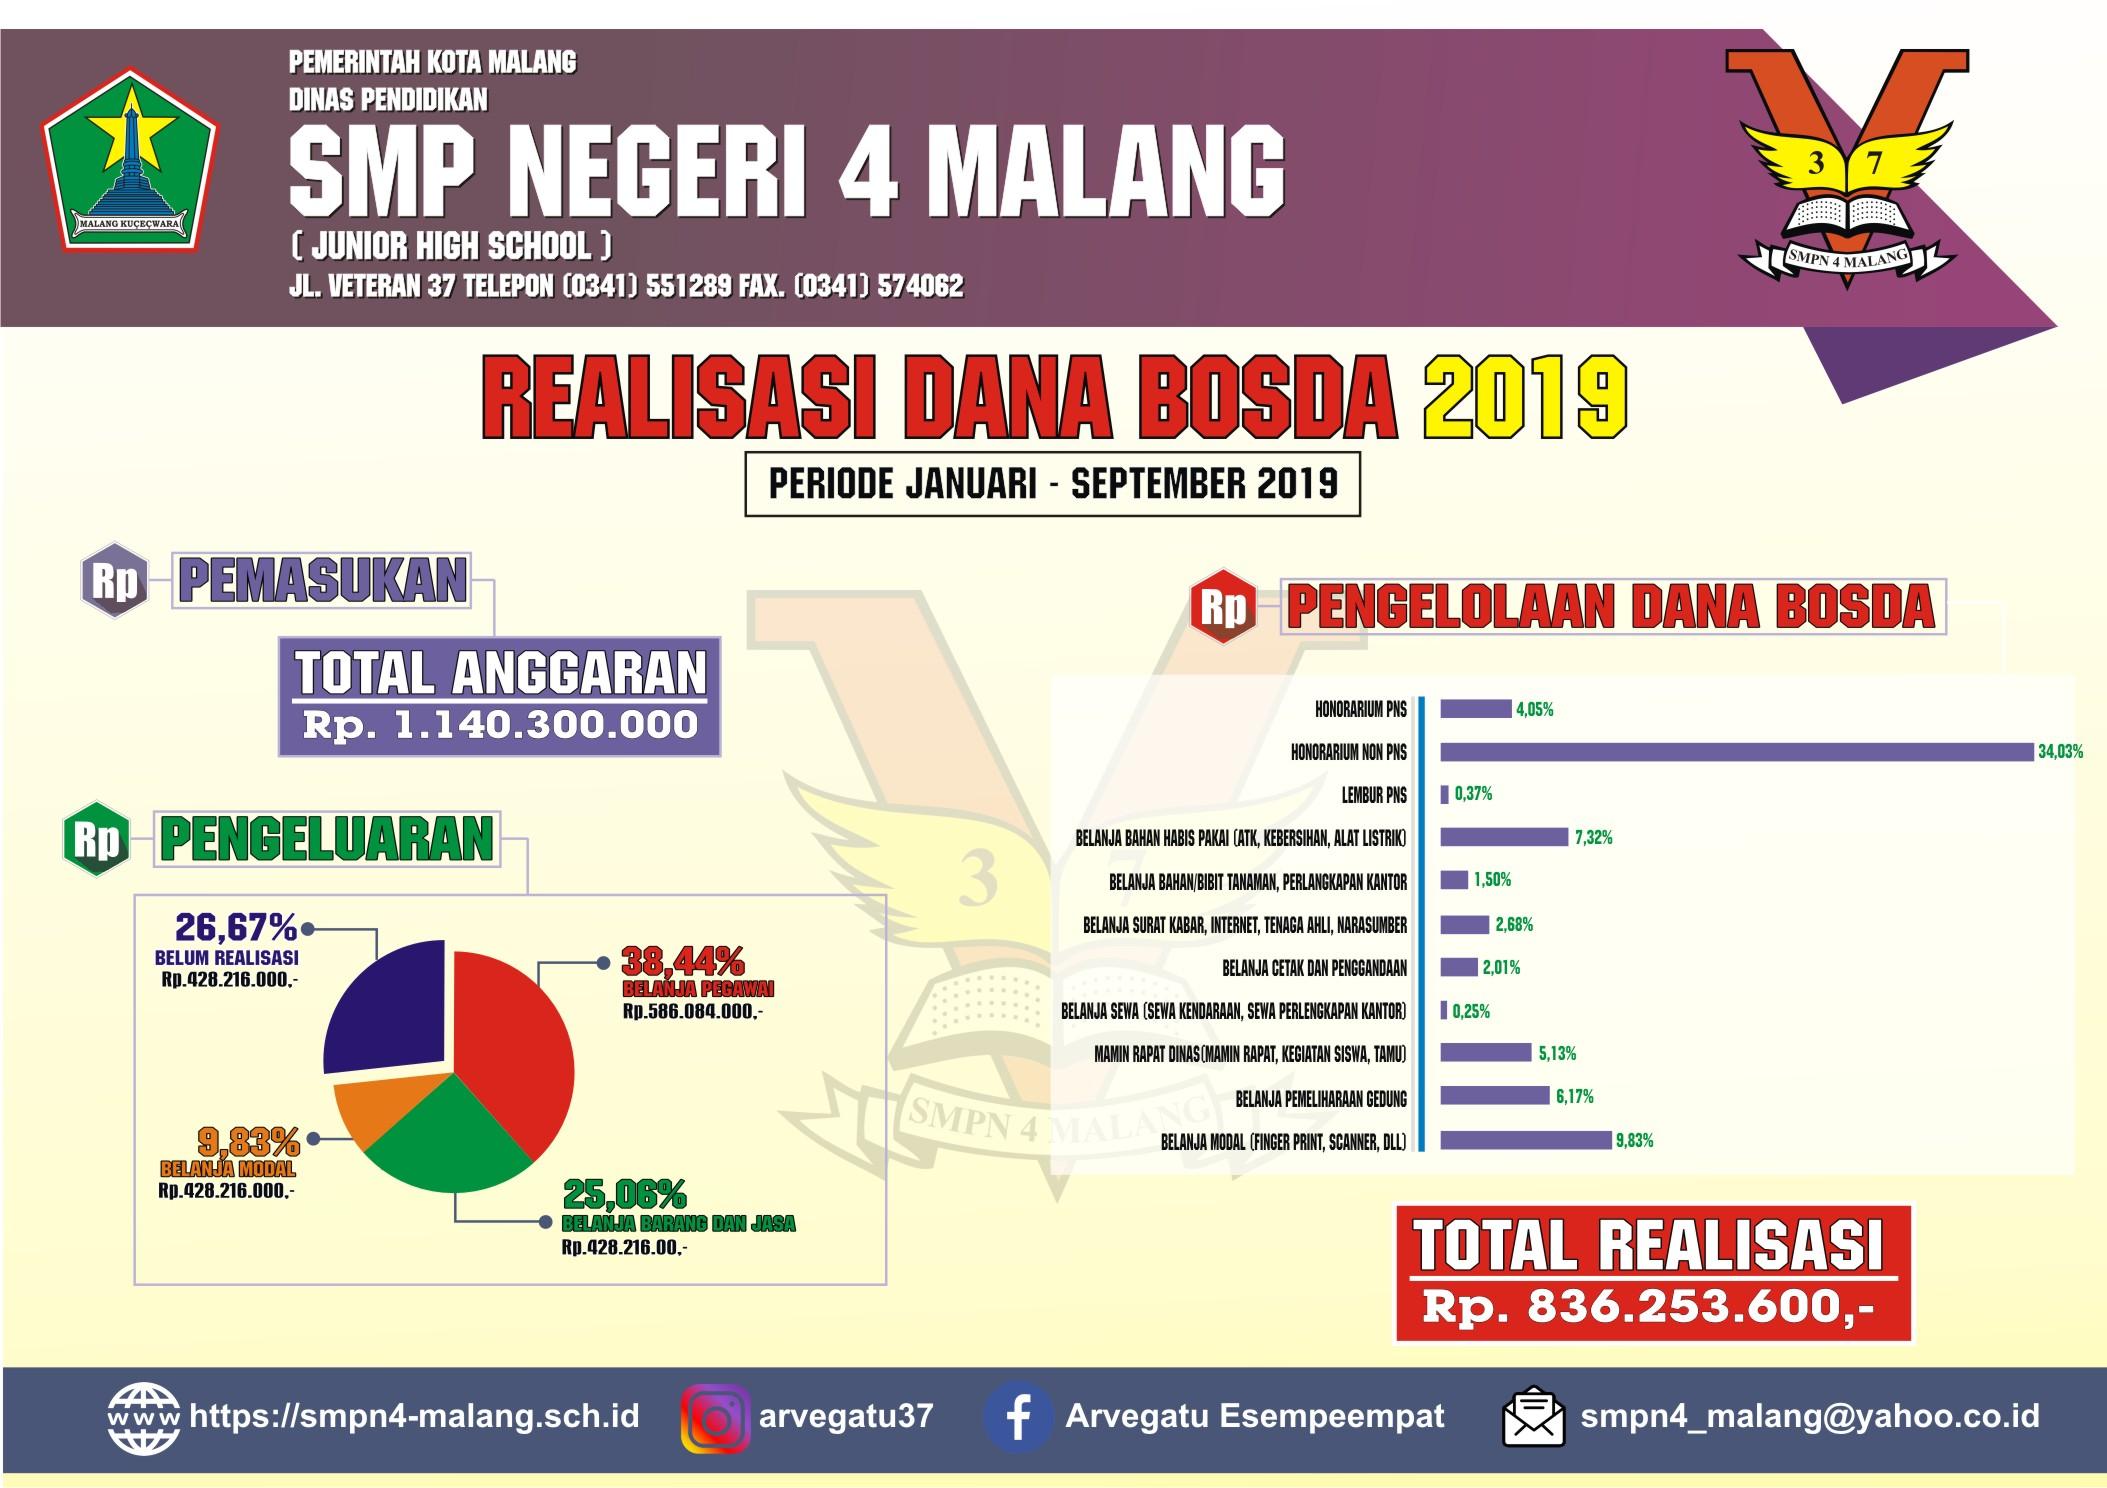 bosda 2019 SMP Negeri 4 Malang